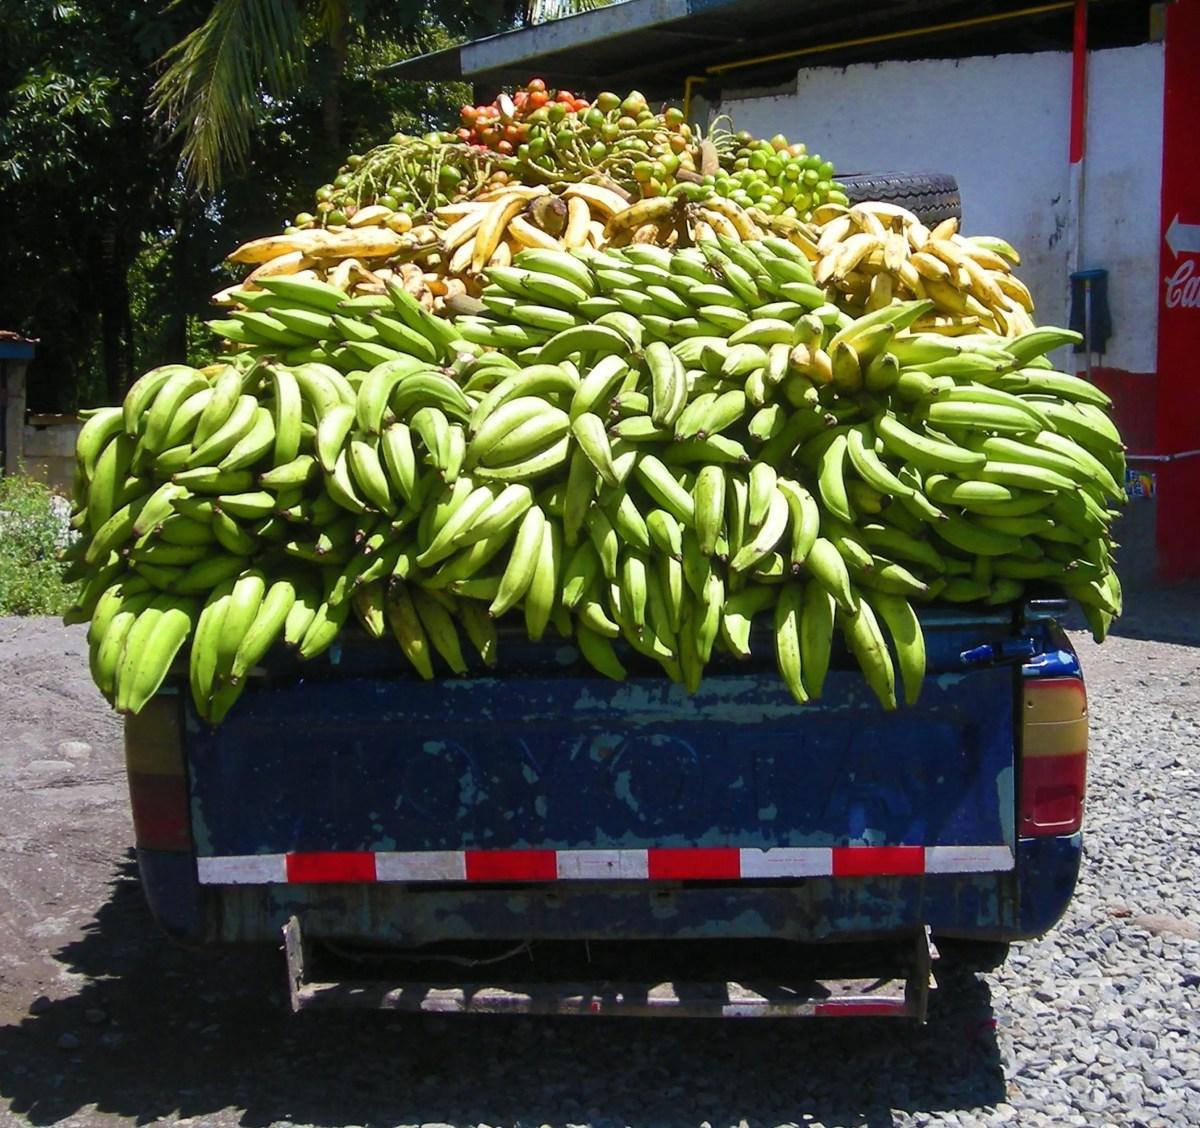 unripe banana delivery